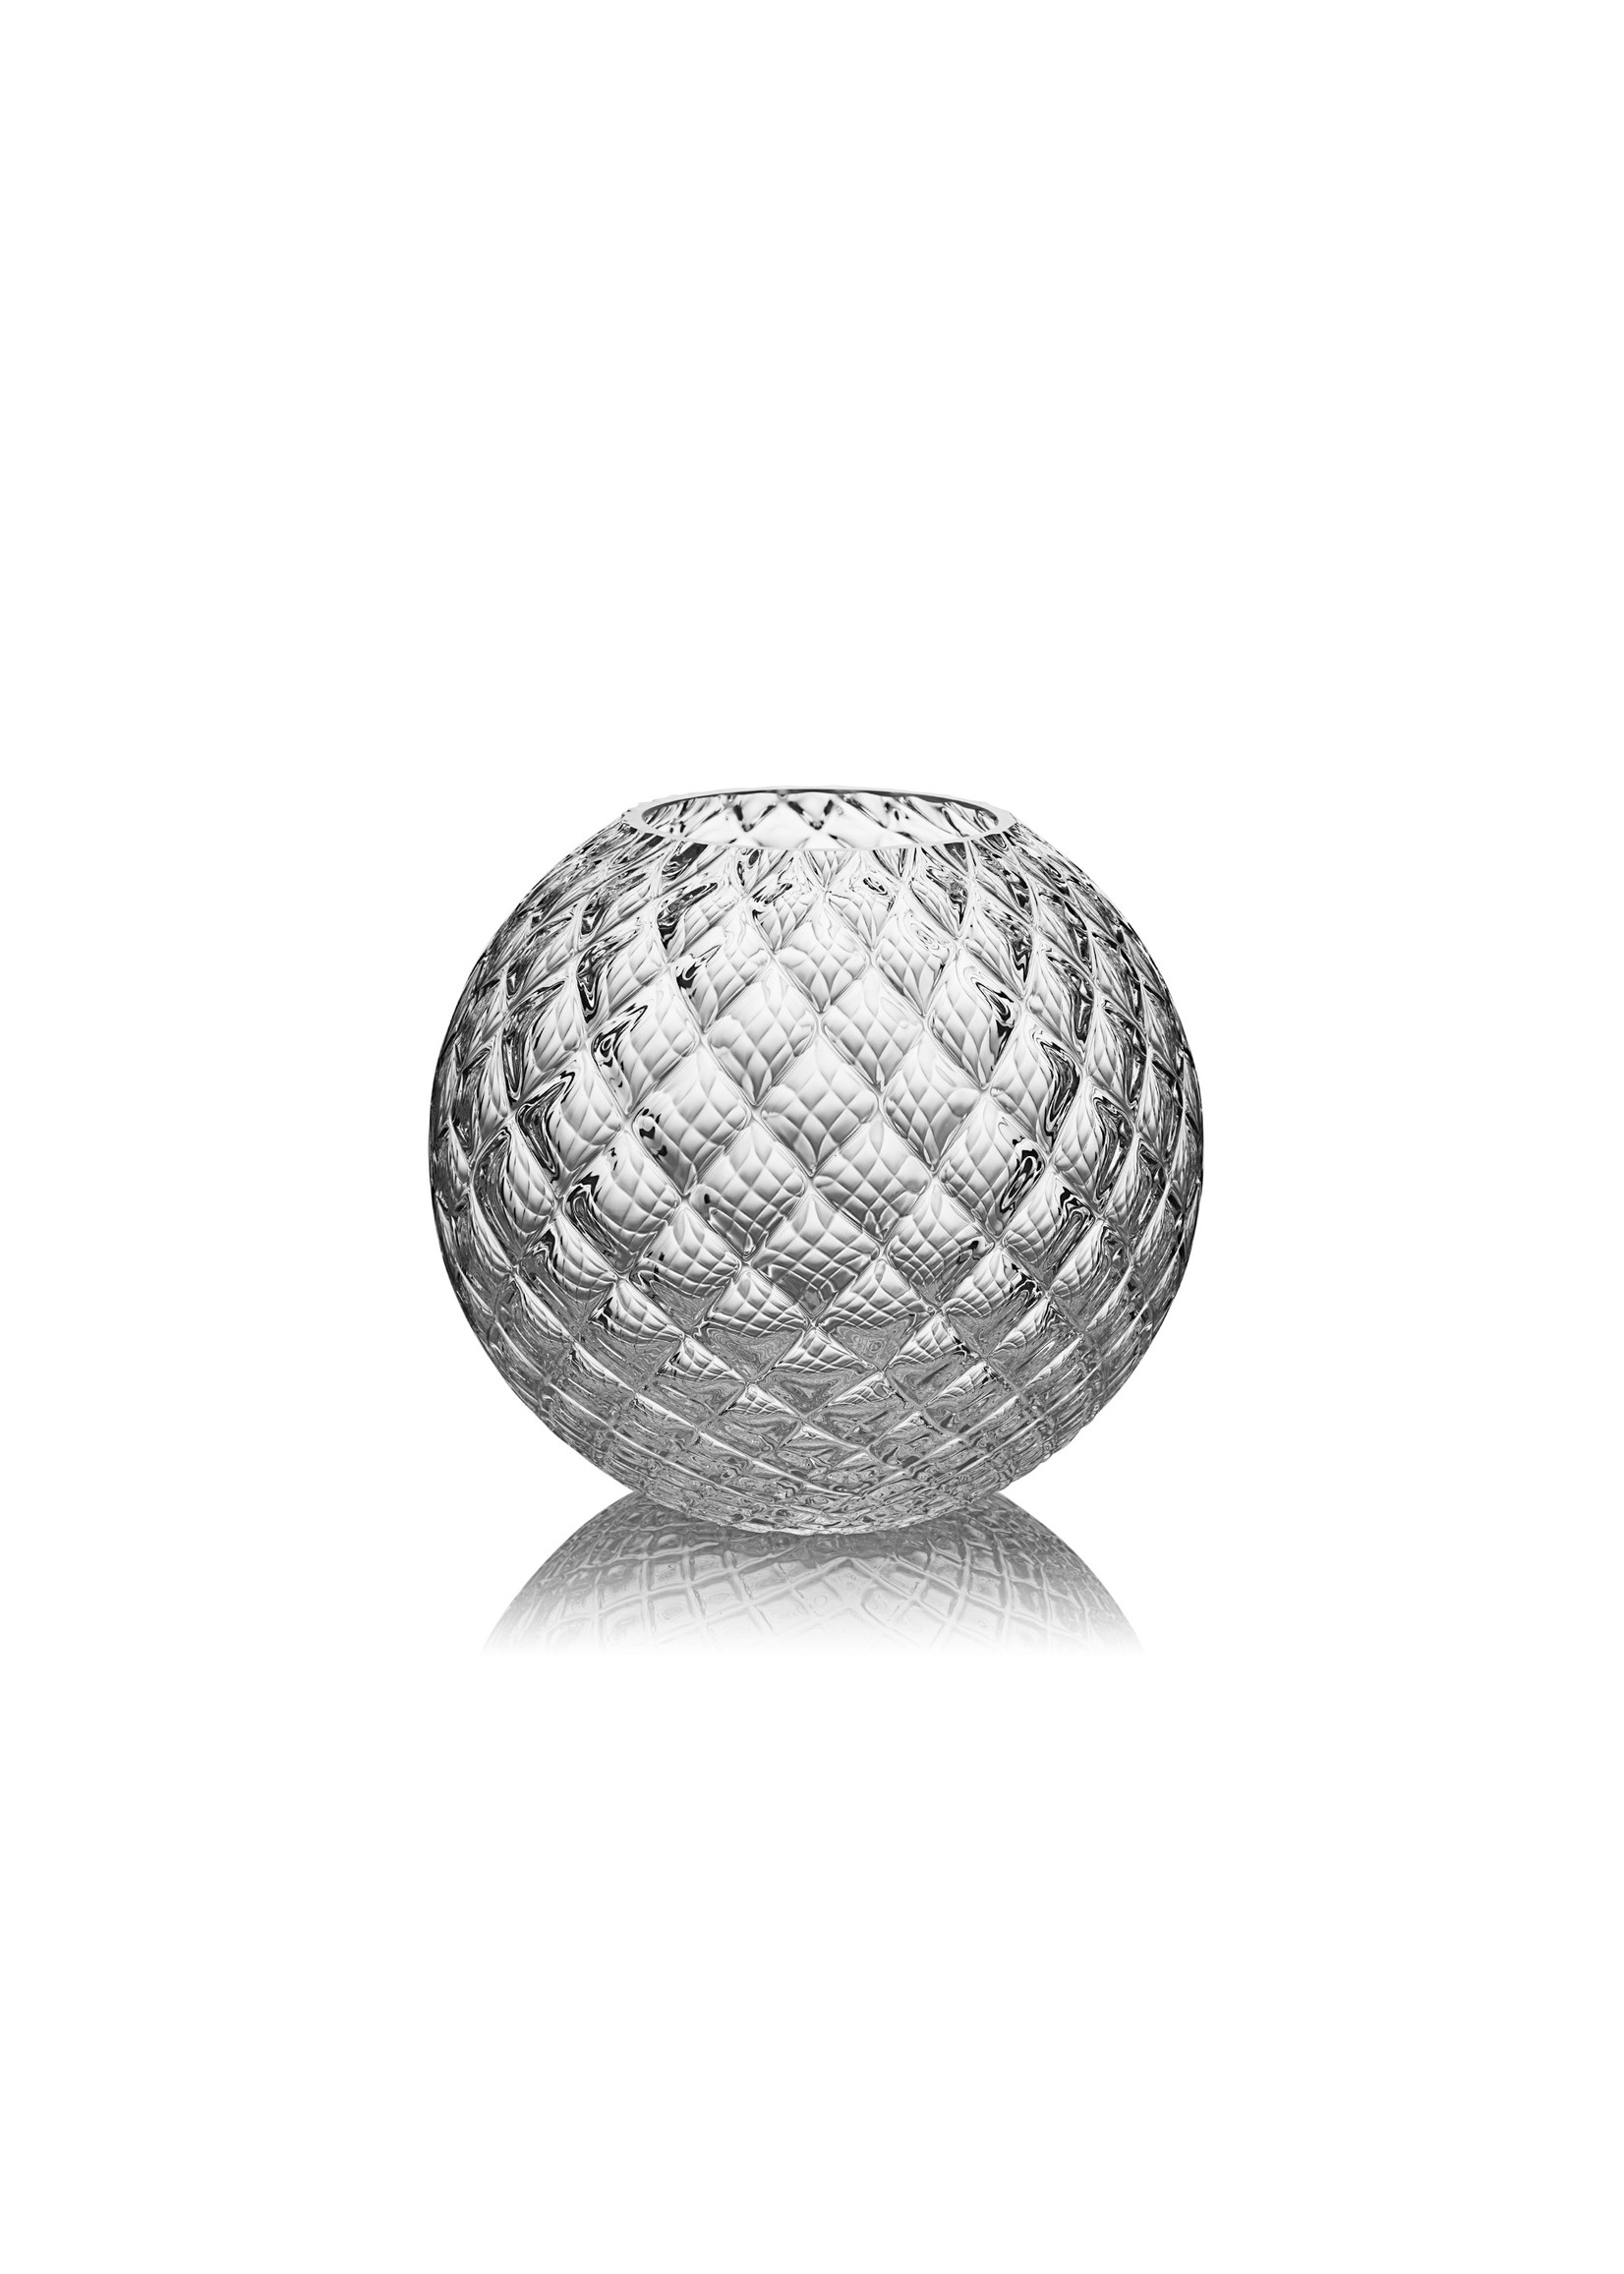 Skloglass Handgemaakt kristallen Dahlia bolvaas 150mm